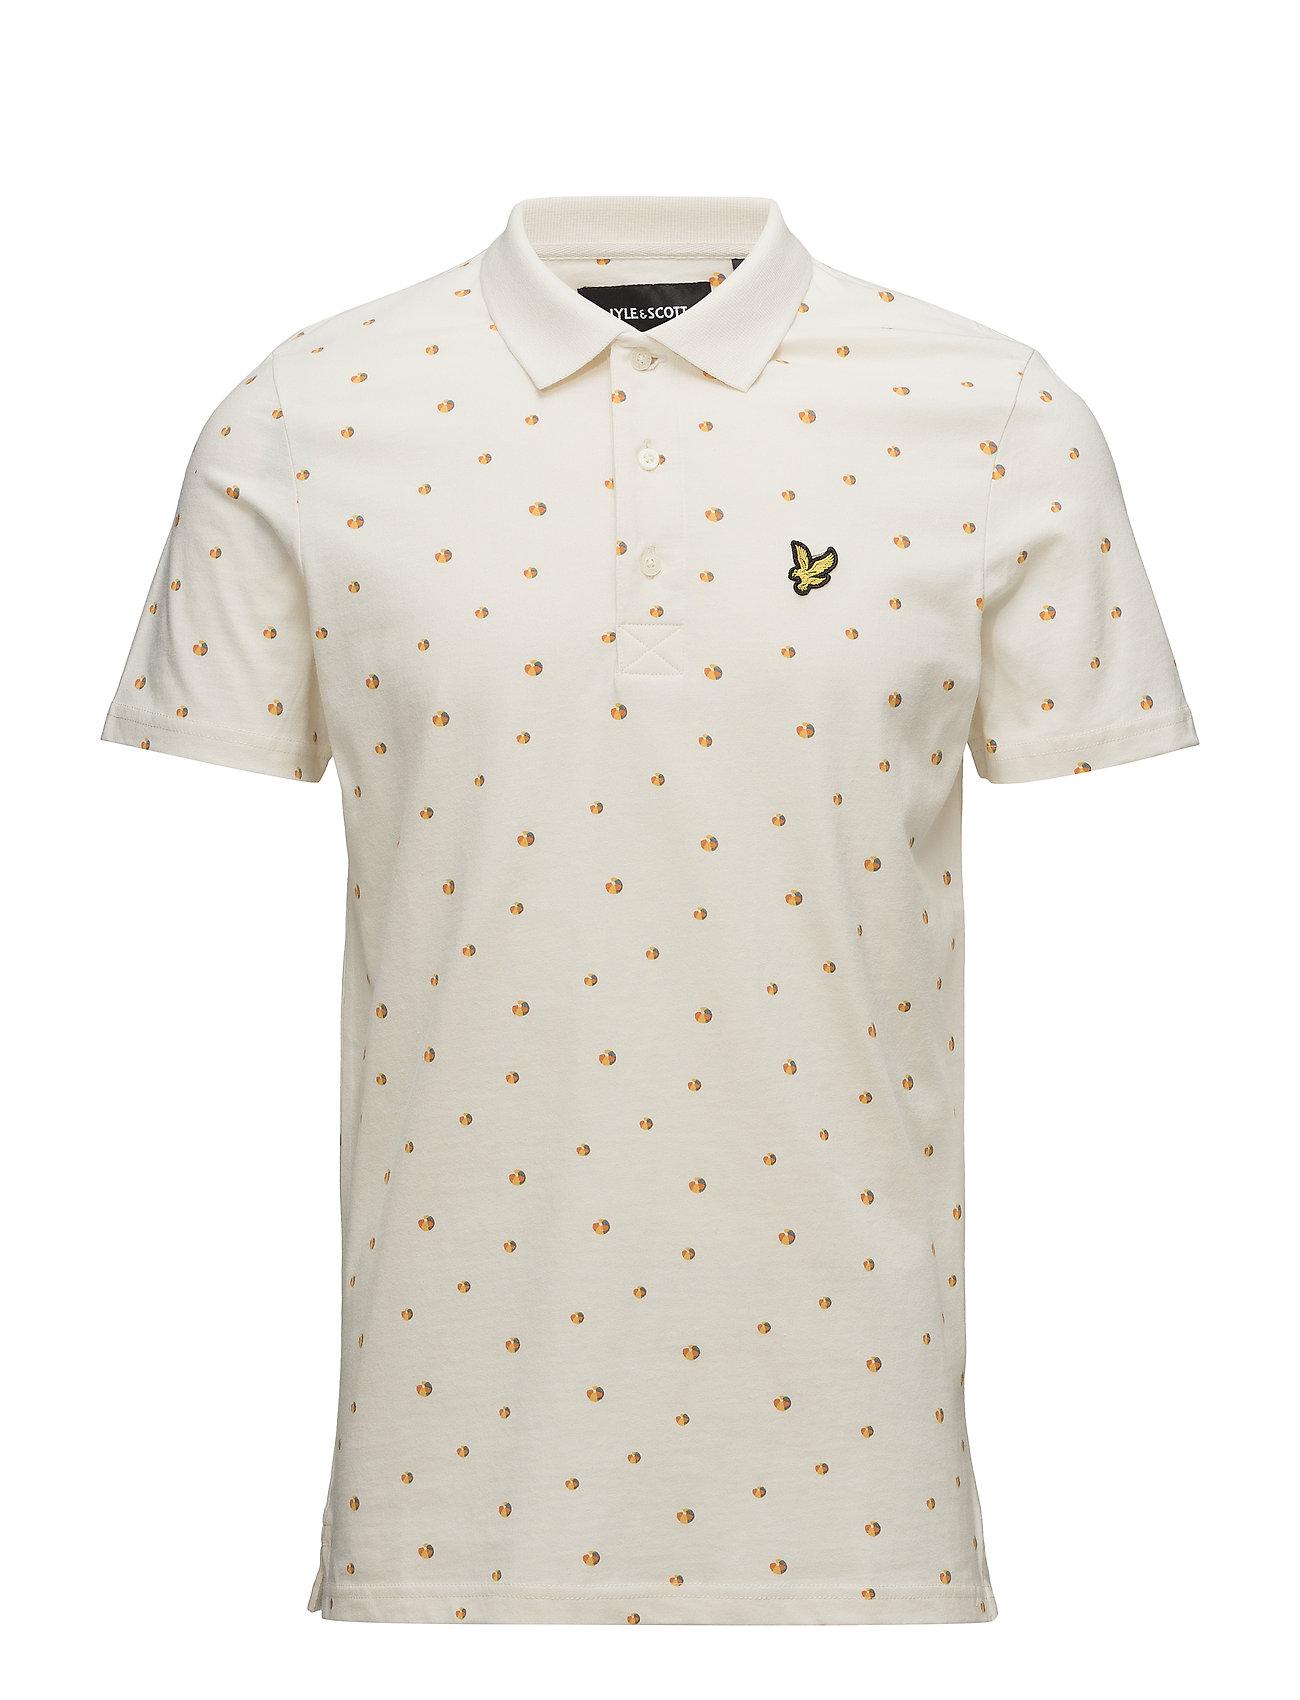 Lyle & Scott Beachball Print Polo Shirt